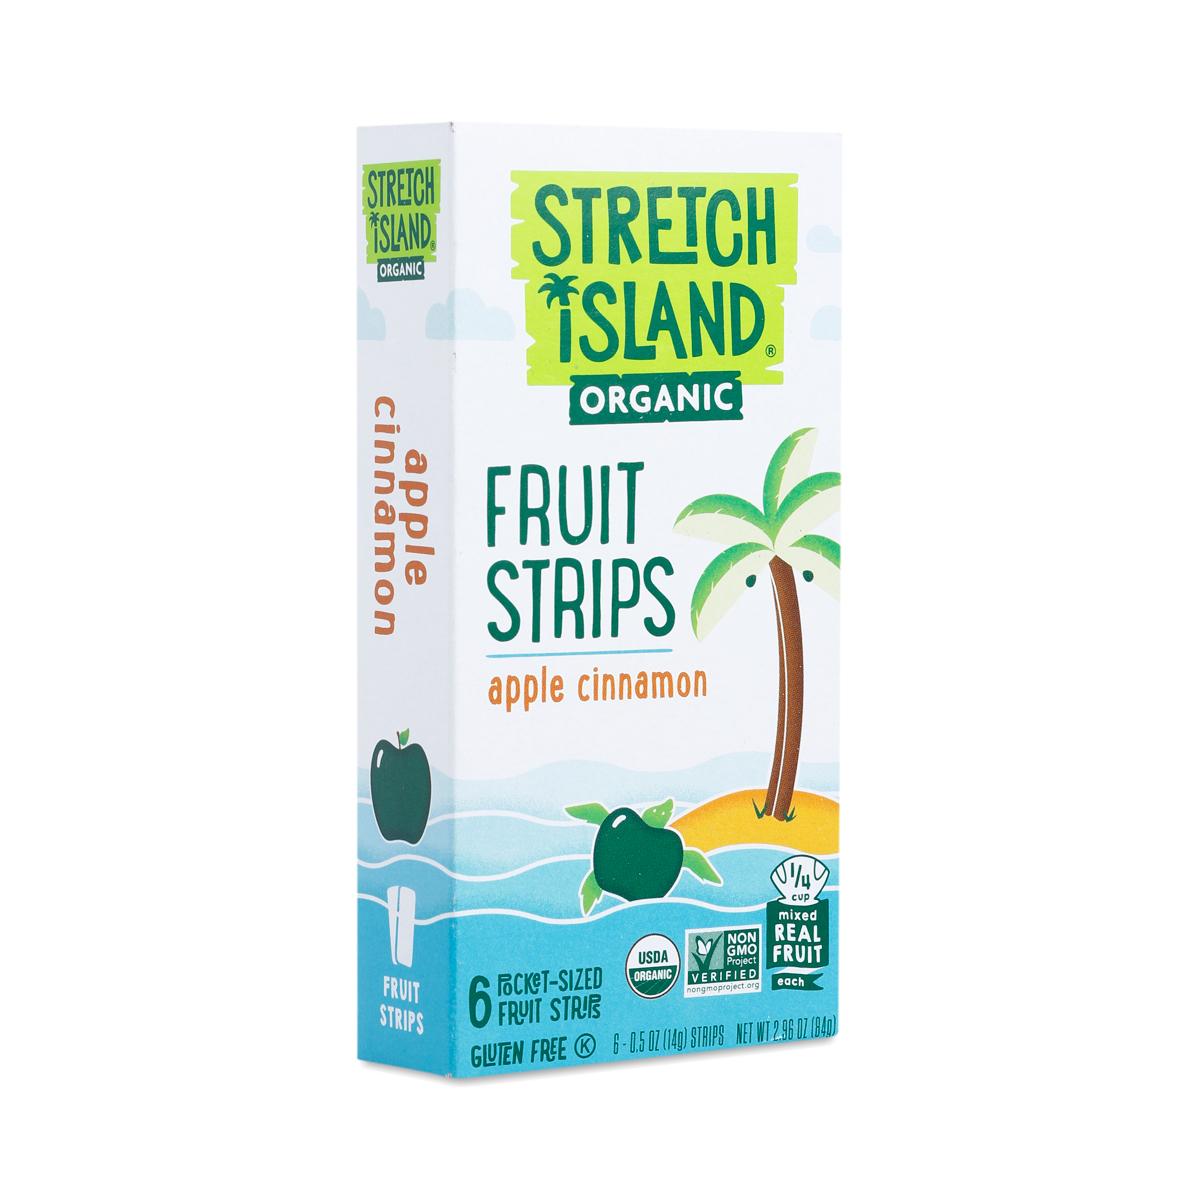 Stretch Island Organic Fruit Strips Apple Cinnamon